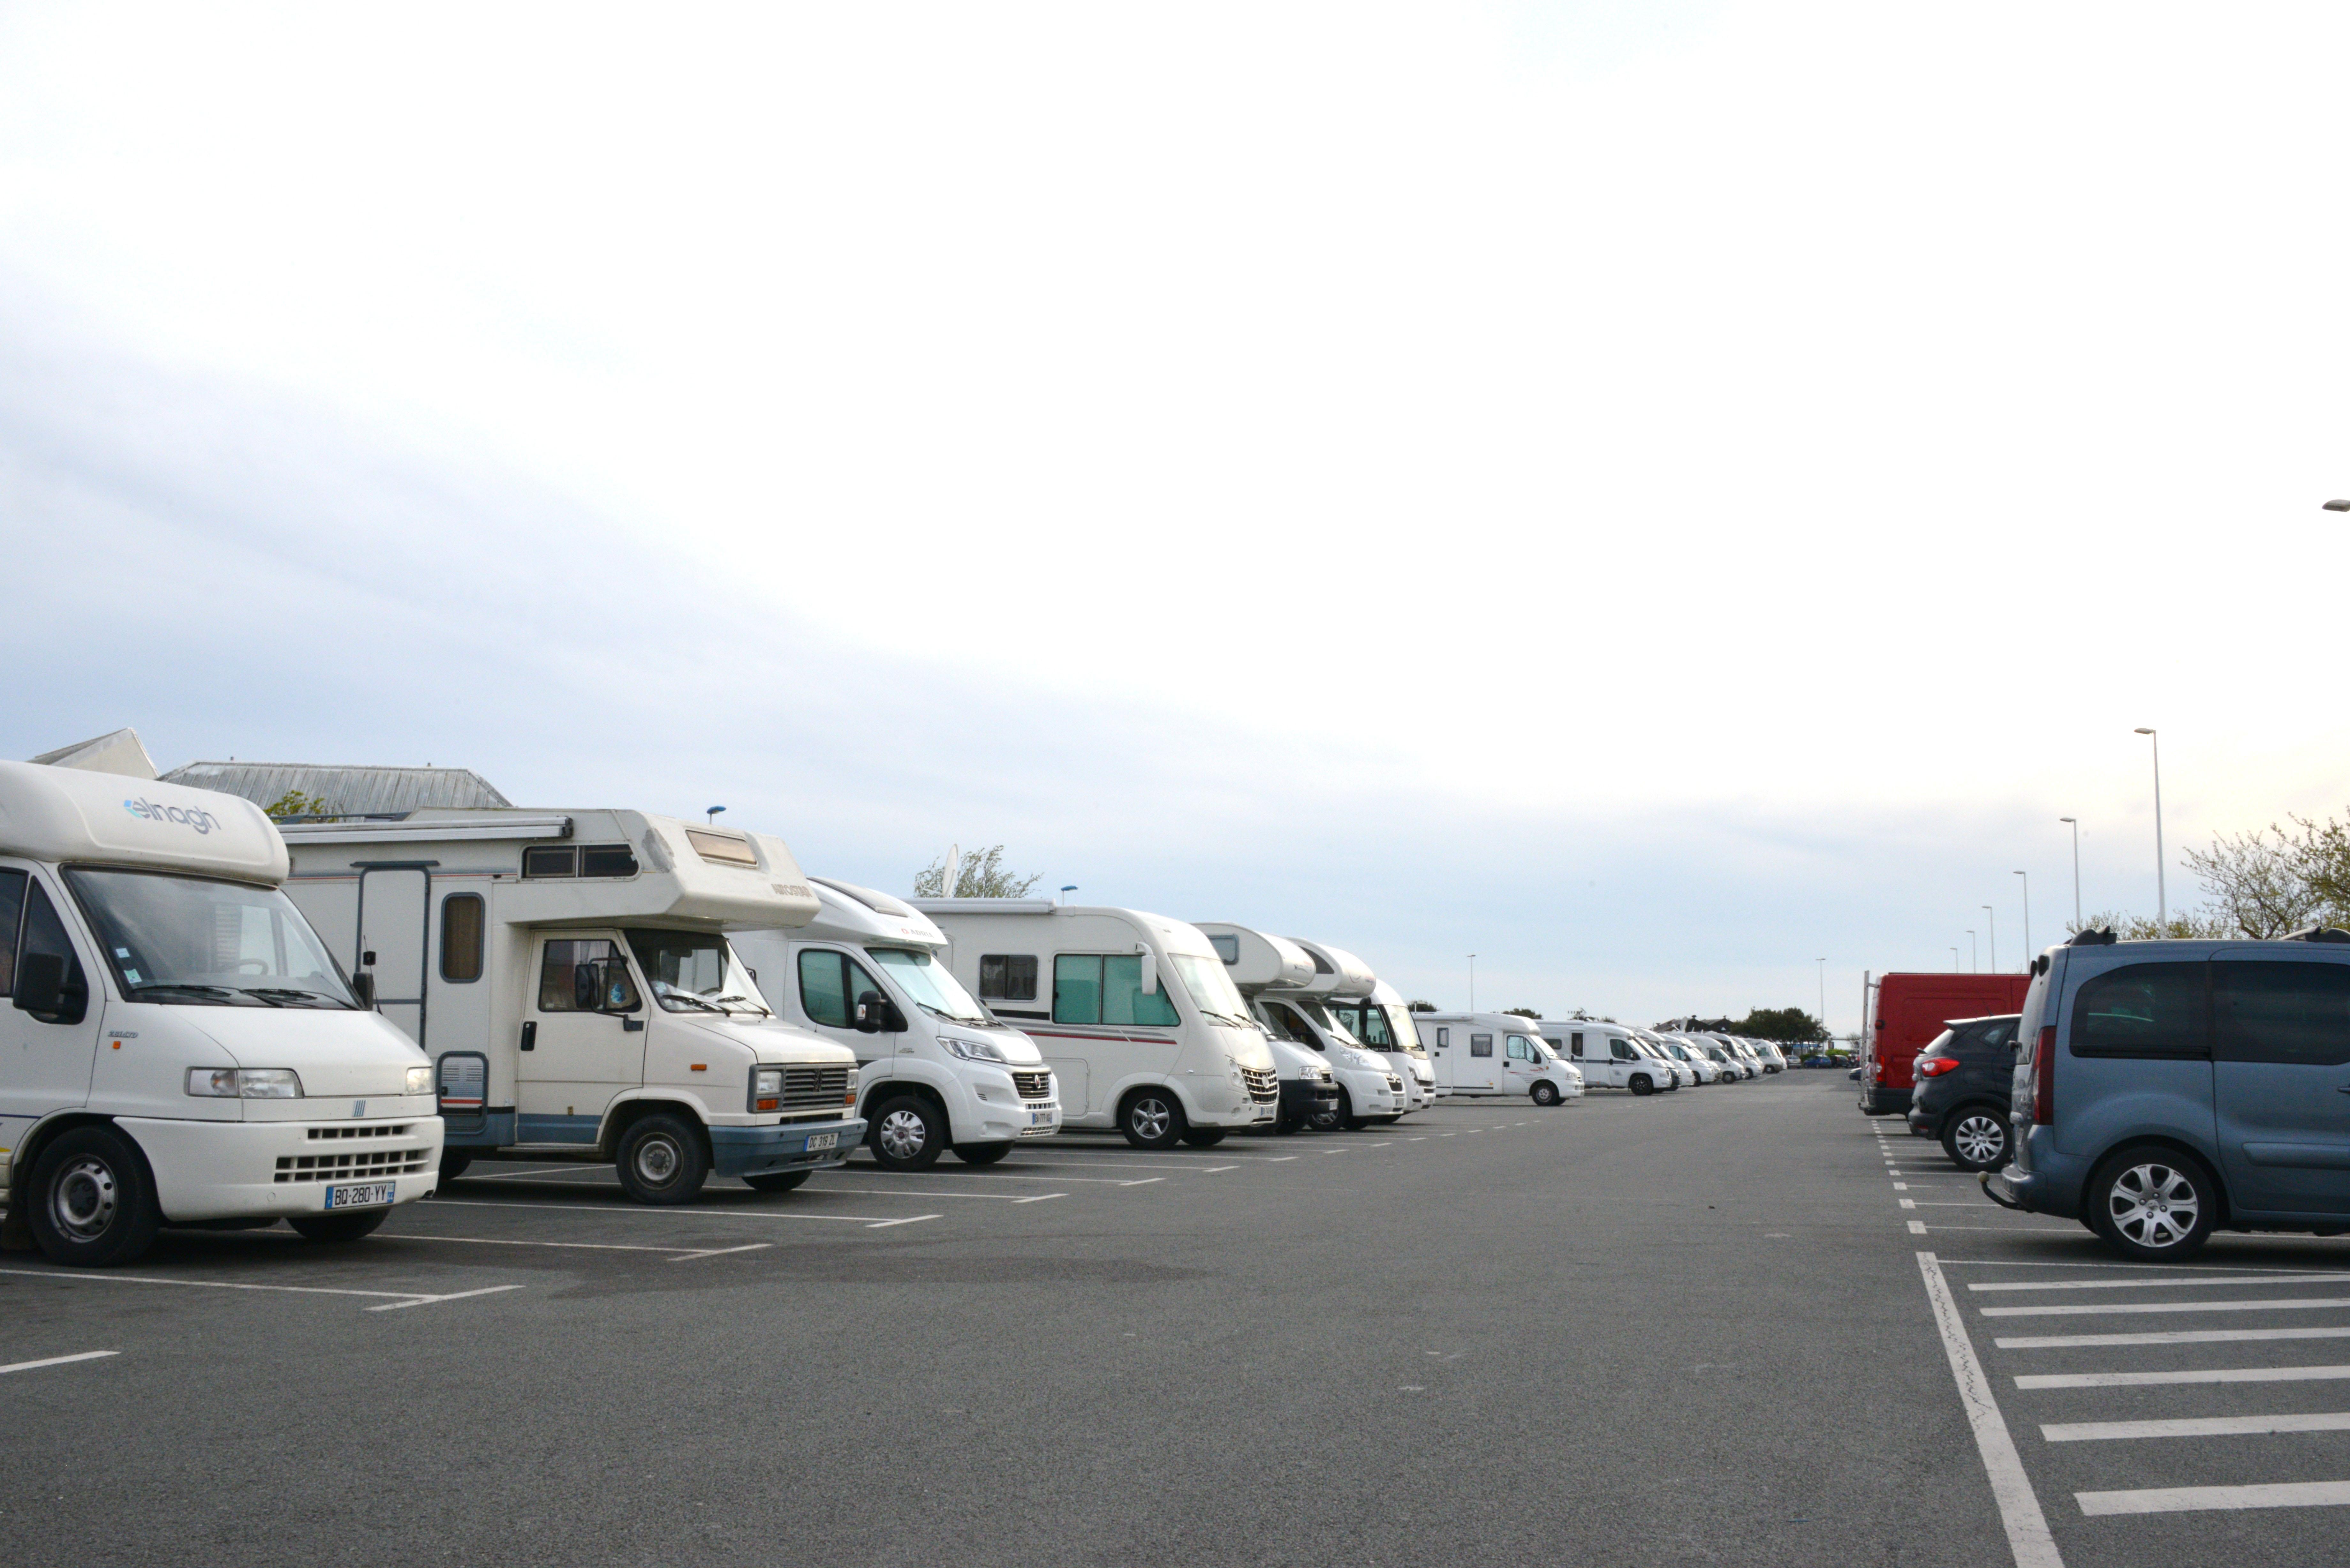 file camping cars sur le parking de la plage 1 jpg wikimedia commons. Black Bedroom Furniture Sets. Home Design Ideas